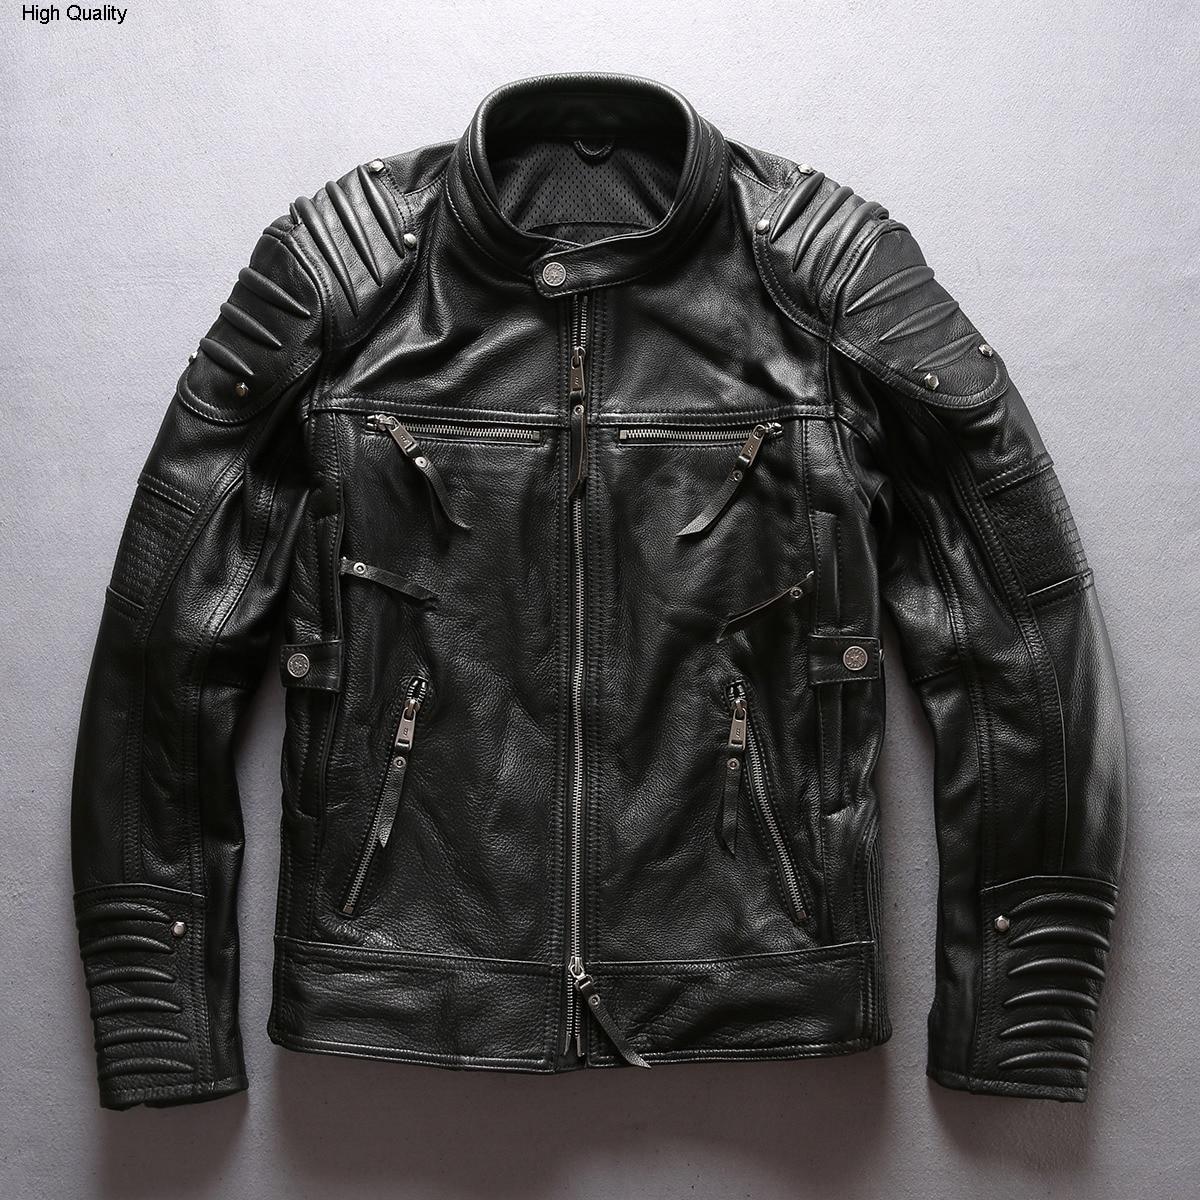 2020 Fashion Brand Men's Professional Motorcycle Leather Jacket Men Stand Collar Cow Leather Coat Men Moto Biker Jacket Male